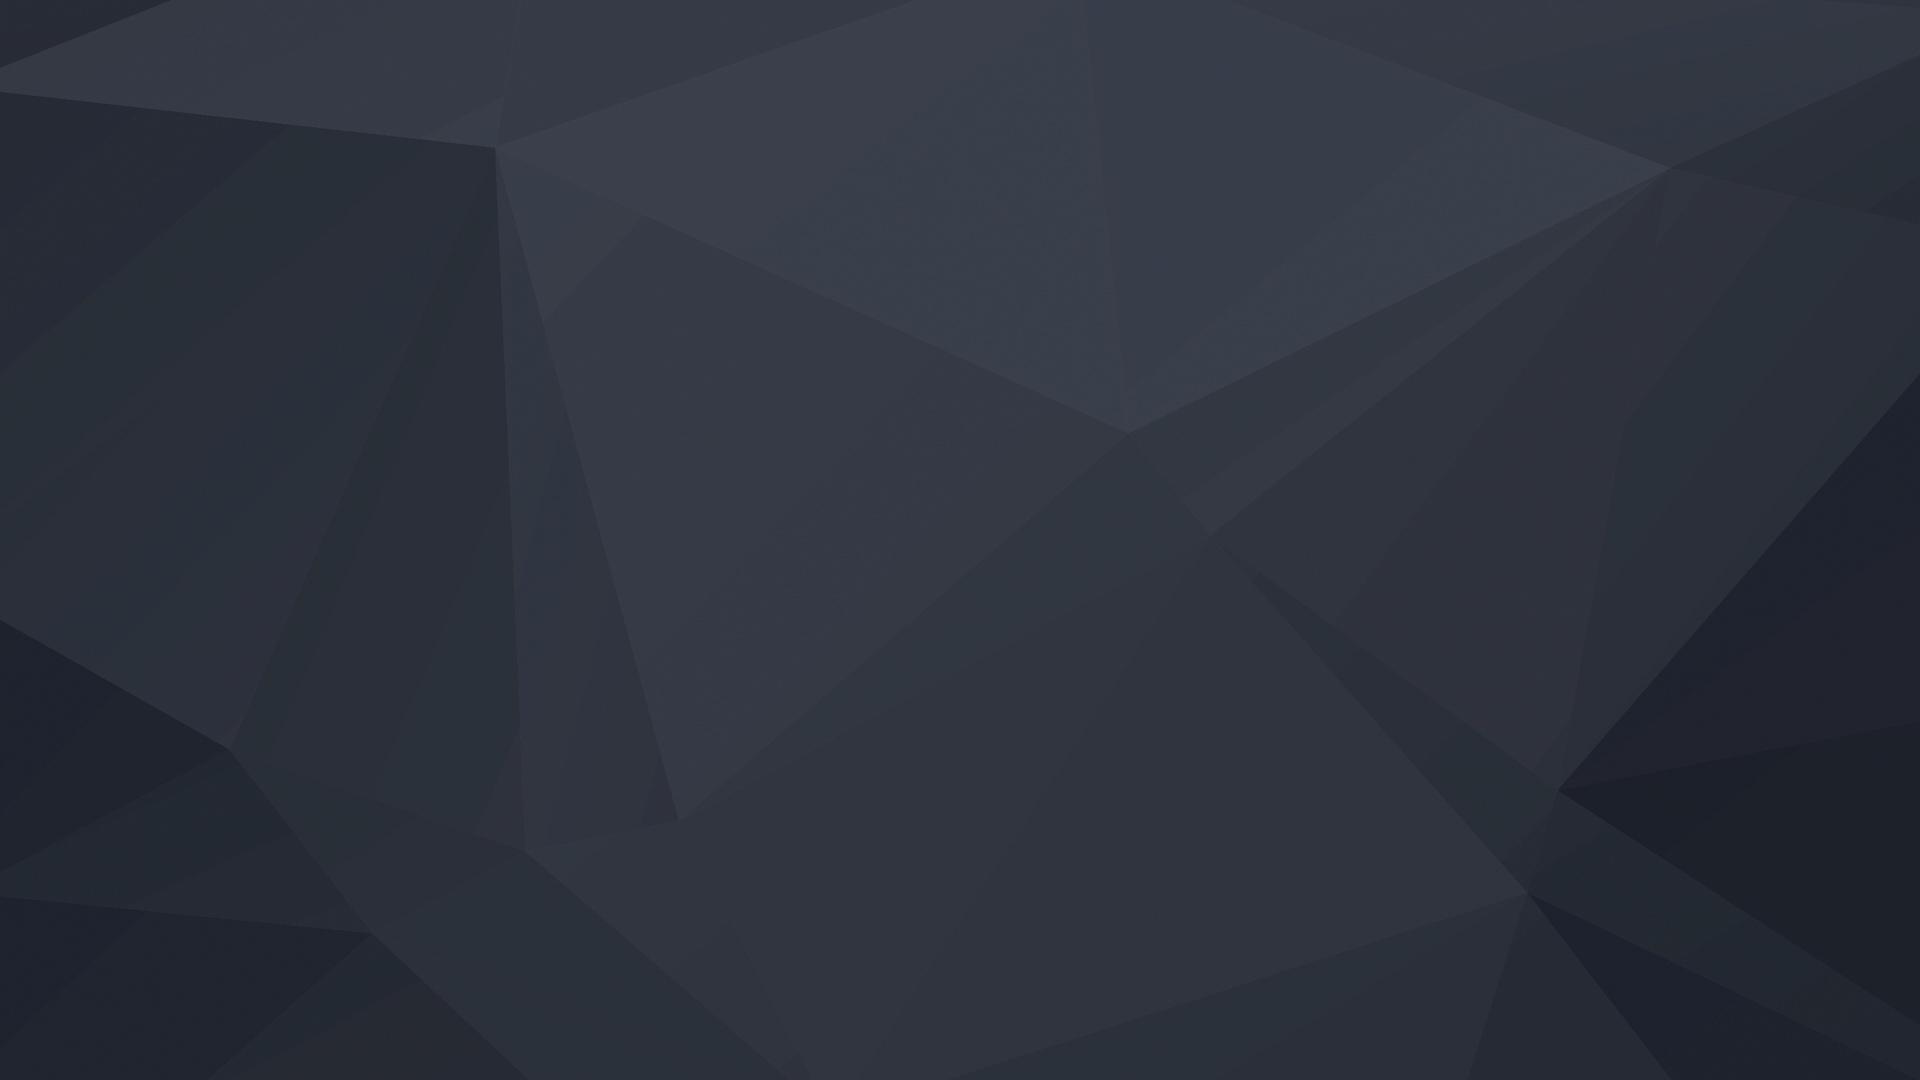 Learn web design with Joomla CMS